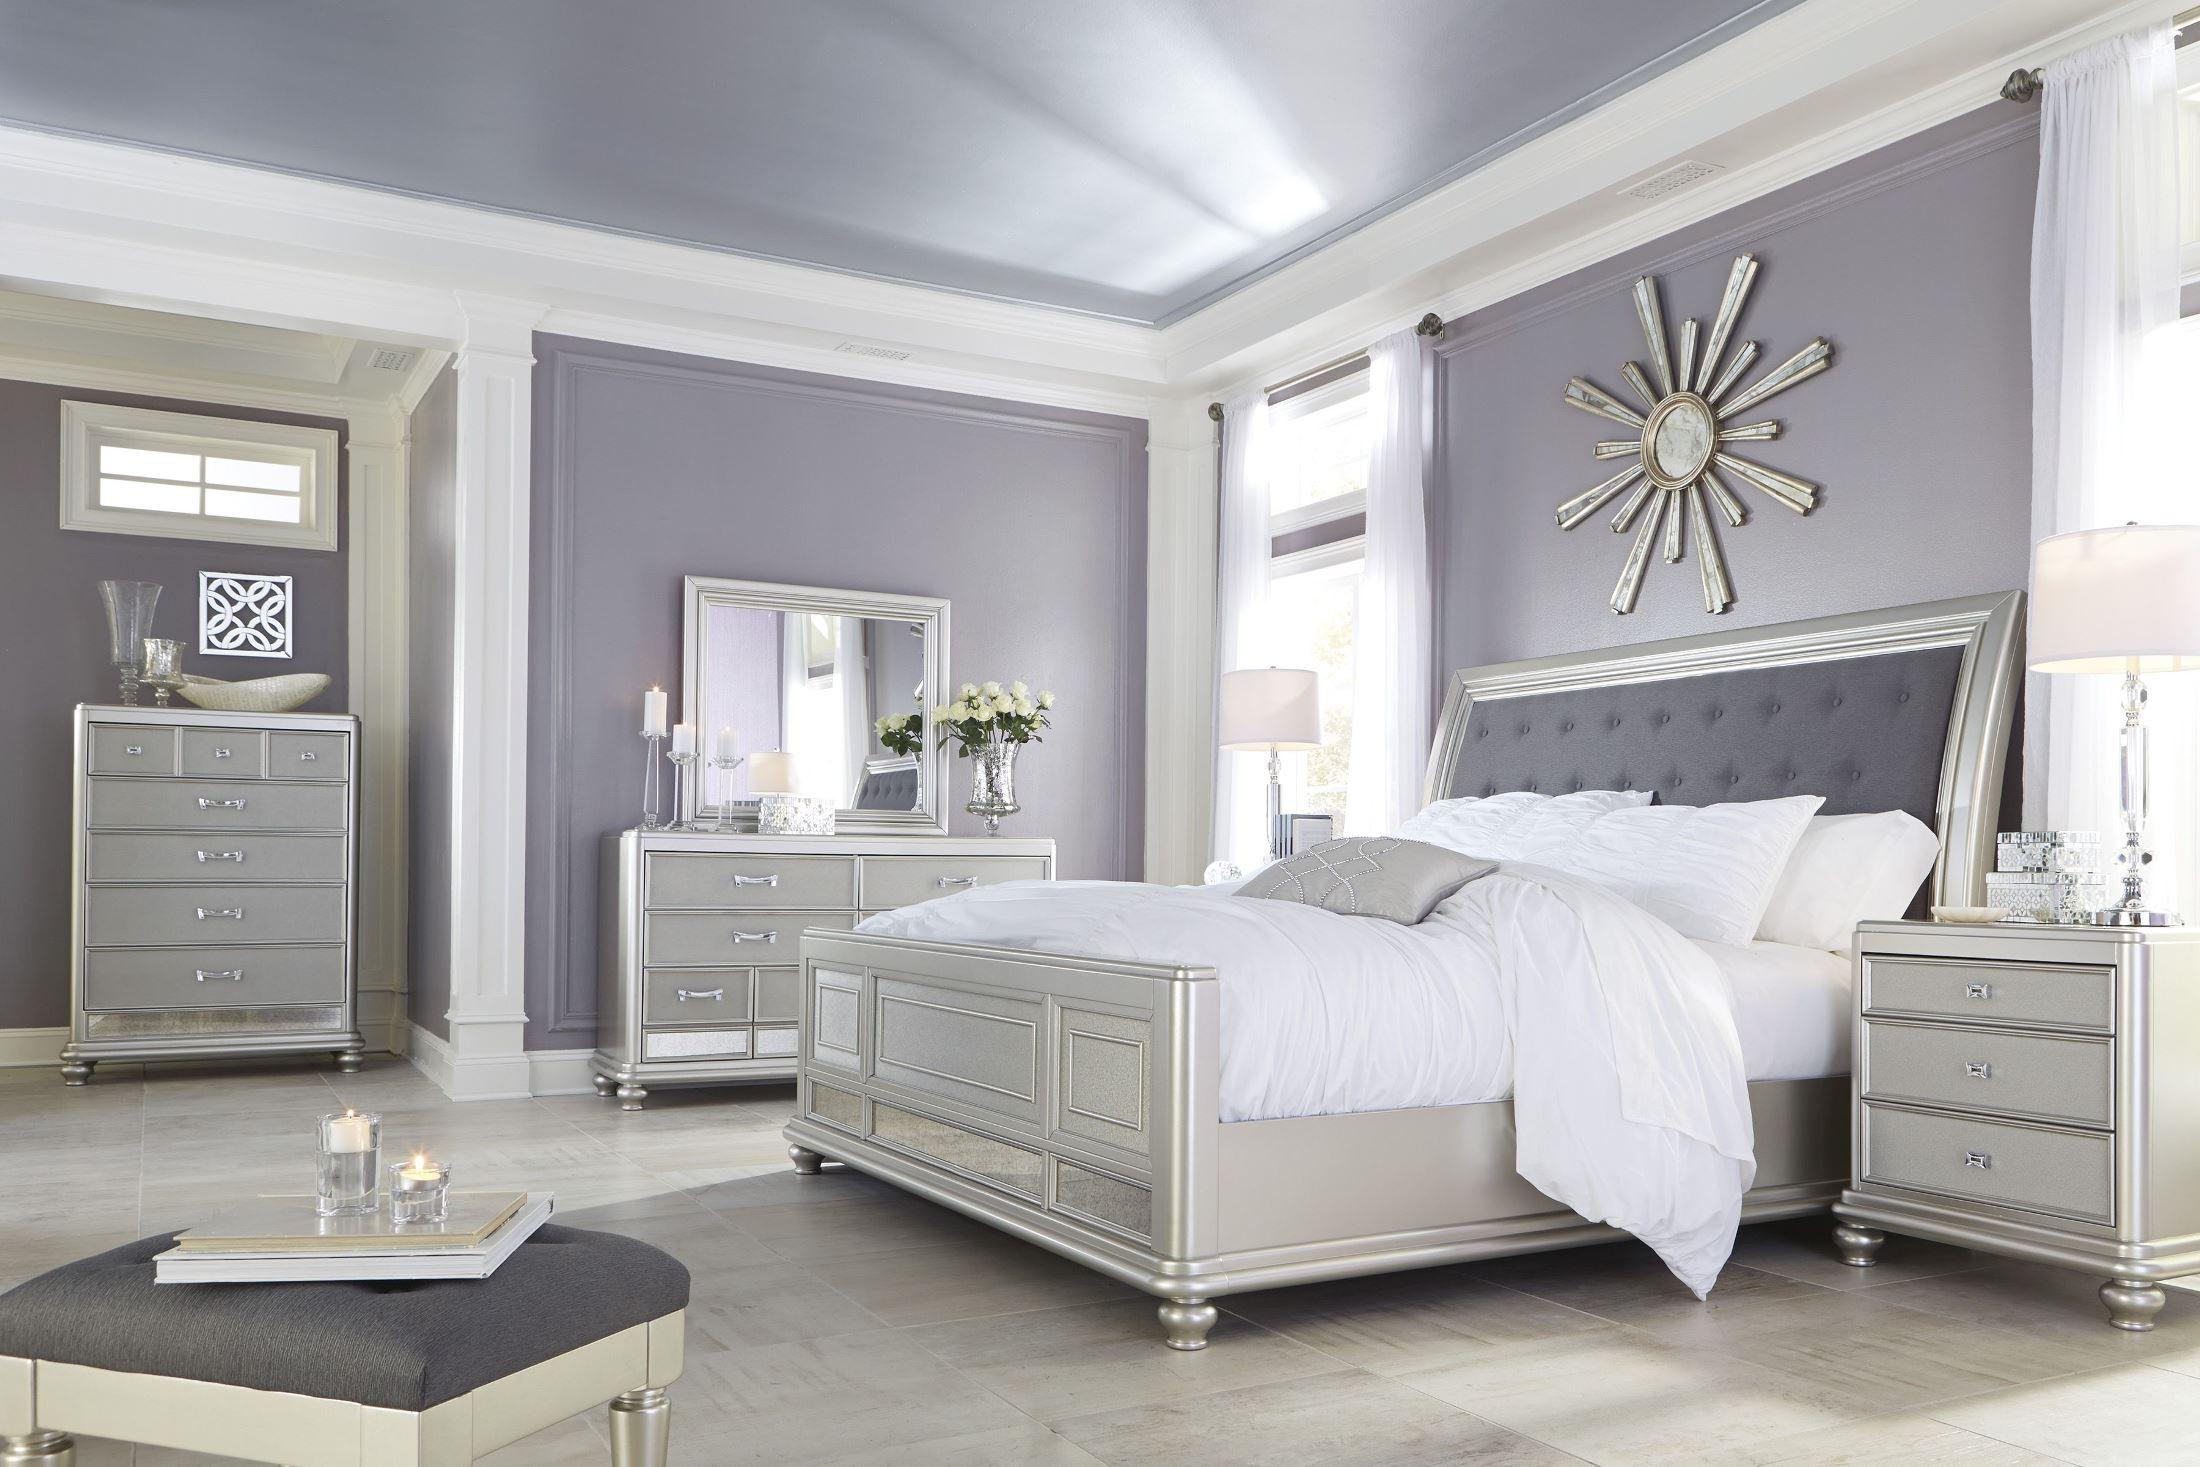 silver bedroom sets photo - 10